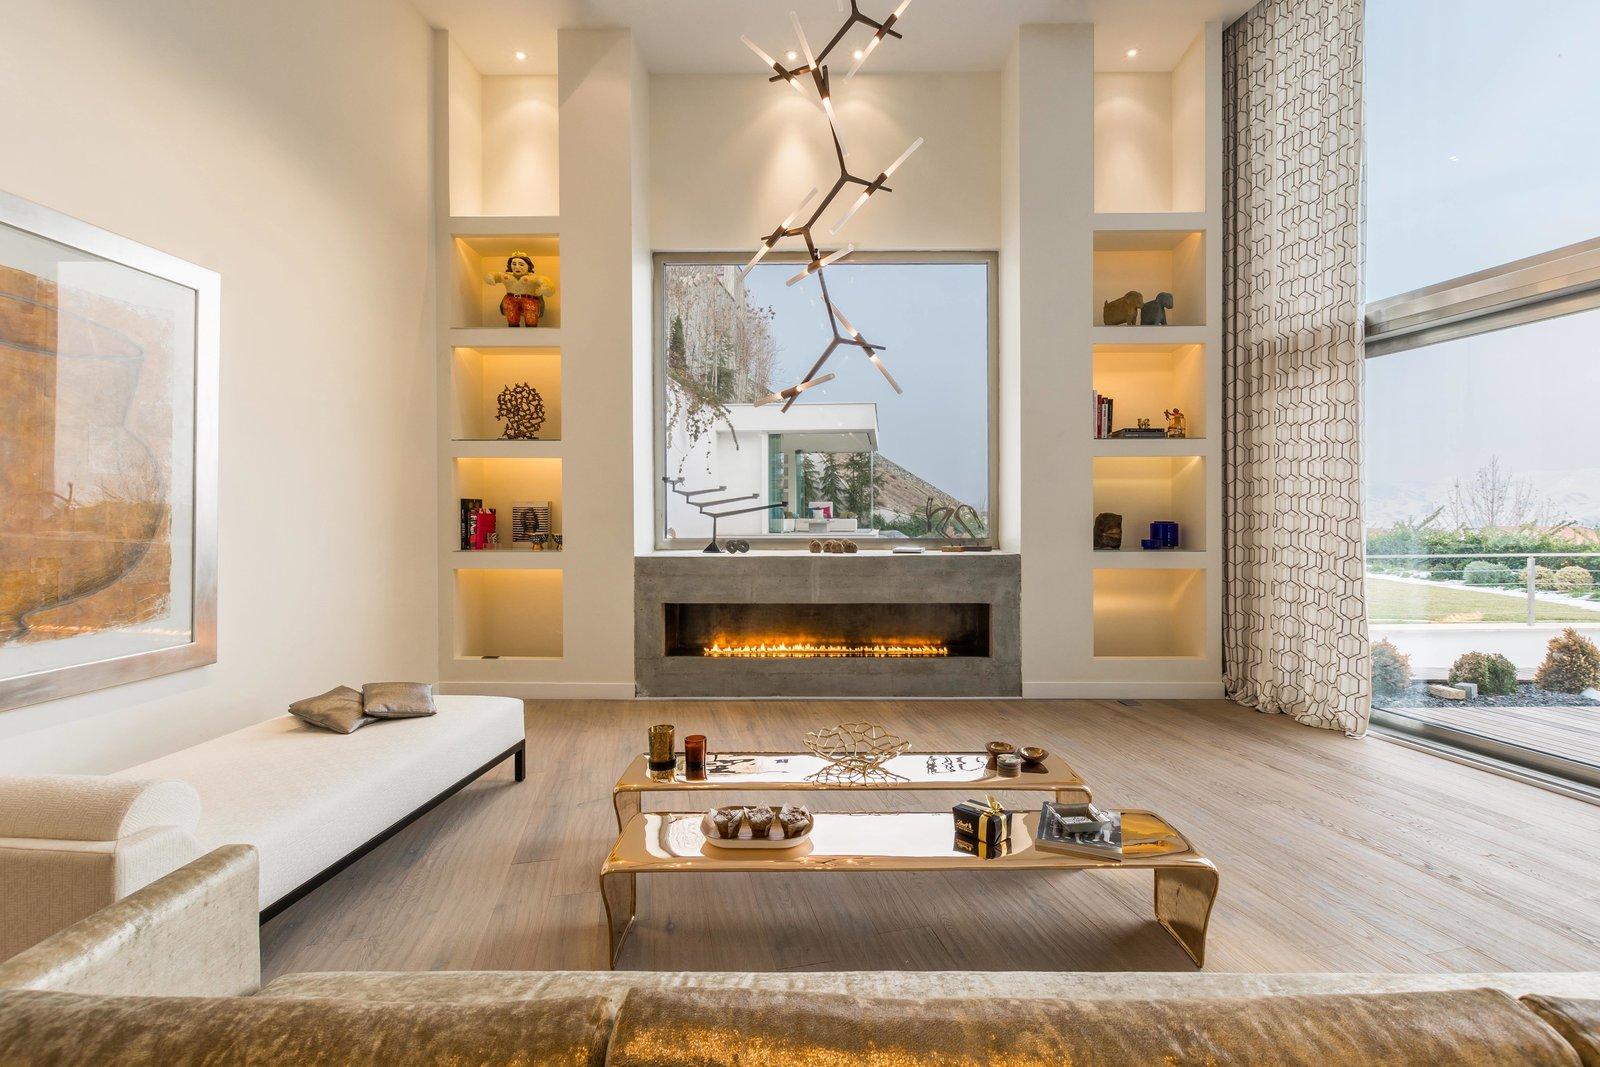 Tagged: Living Room, Sofa, Coffee Tables, Bookcase, Ceiling Lighting, Light Hardwood Floor, and Gas Burning Fireplace.  Lavasan Villa by Hariri & Hariri Architecture